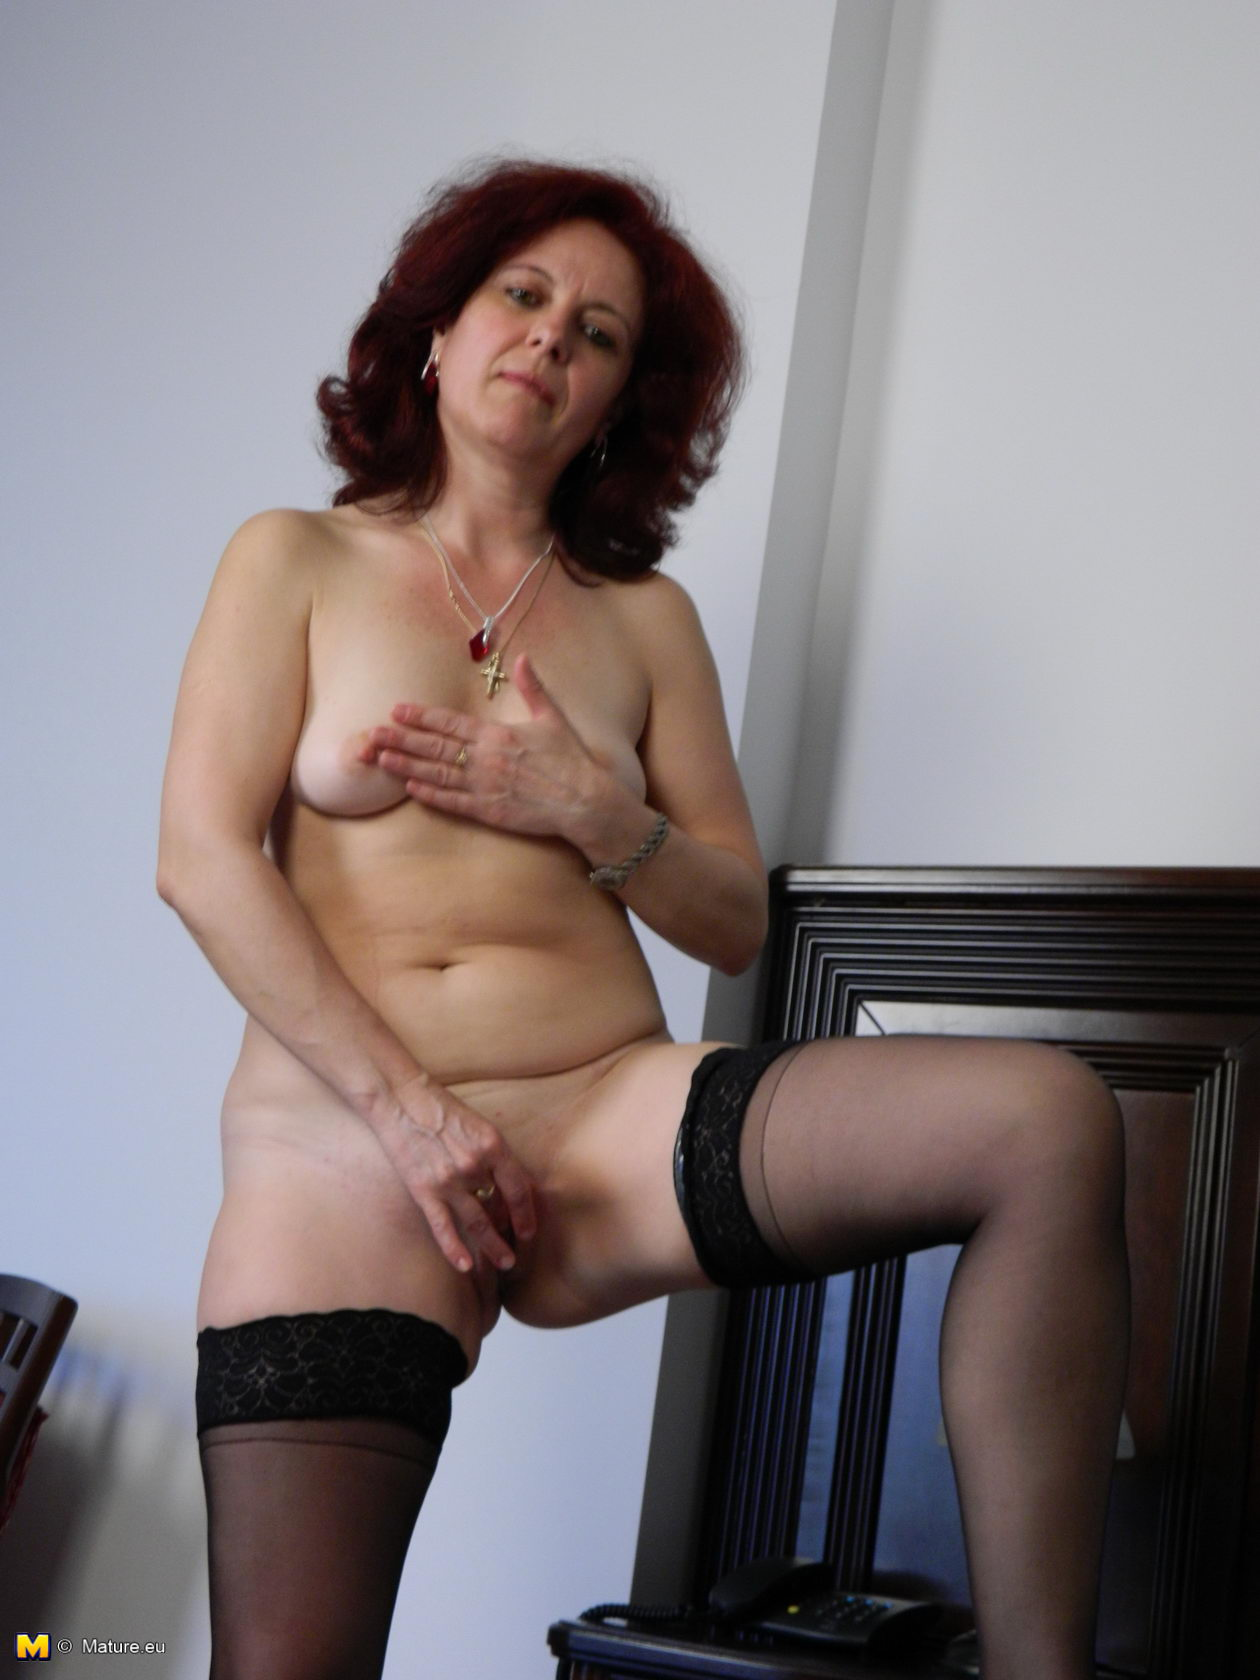 Horny mature naked hairy women